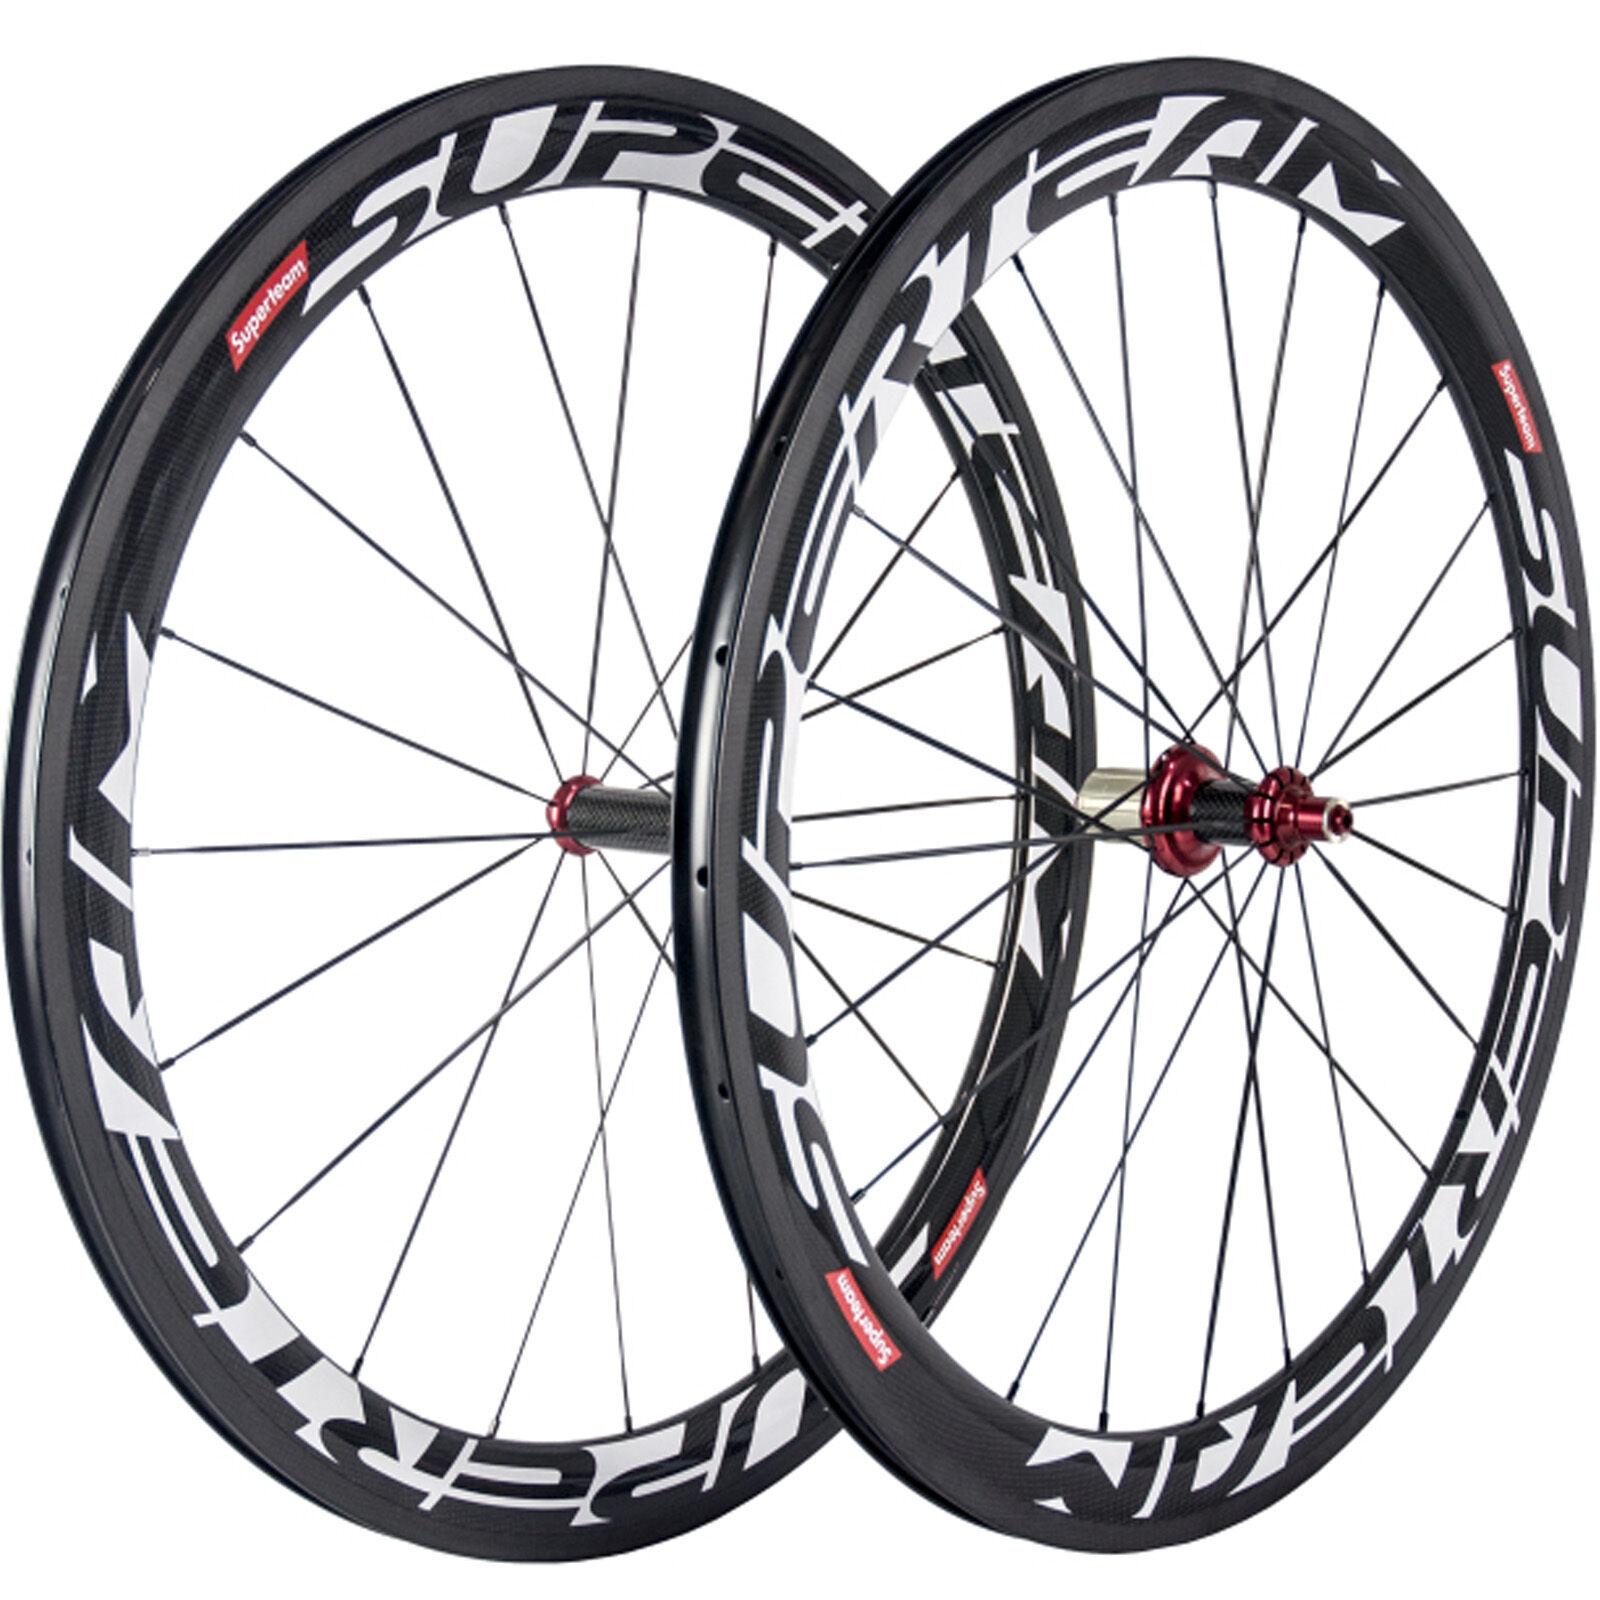 SUPERTEAM 50mm Clincher Carbon Wheelset Road Bike Carbon Wheels Cycling Wheel